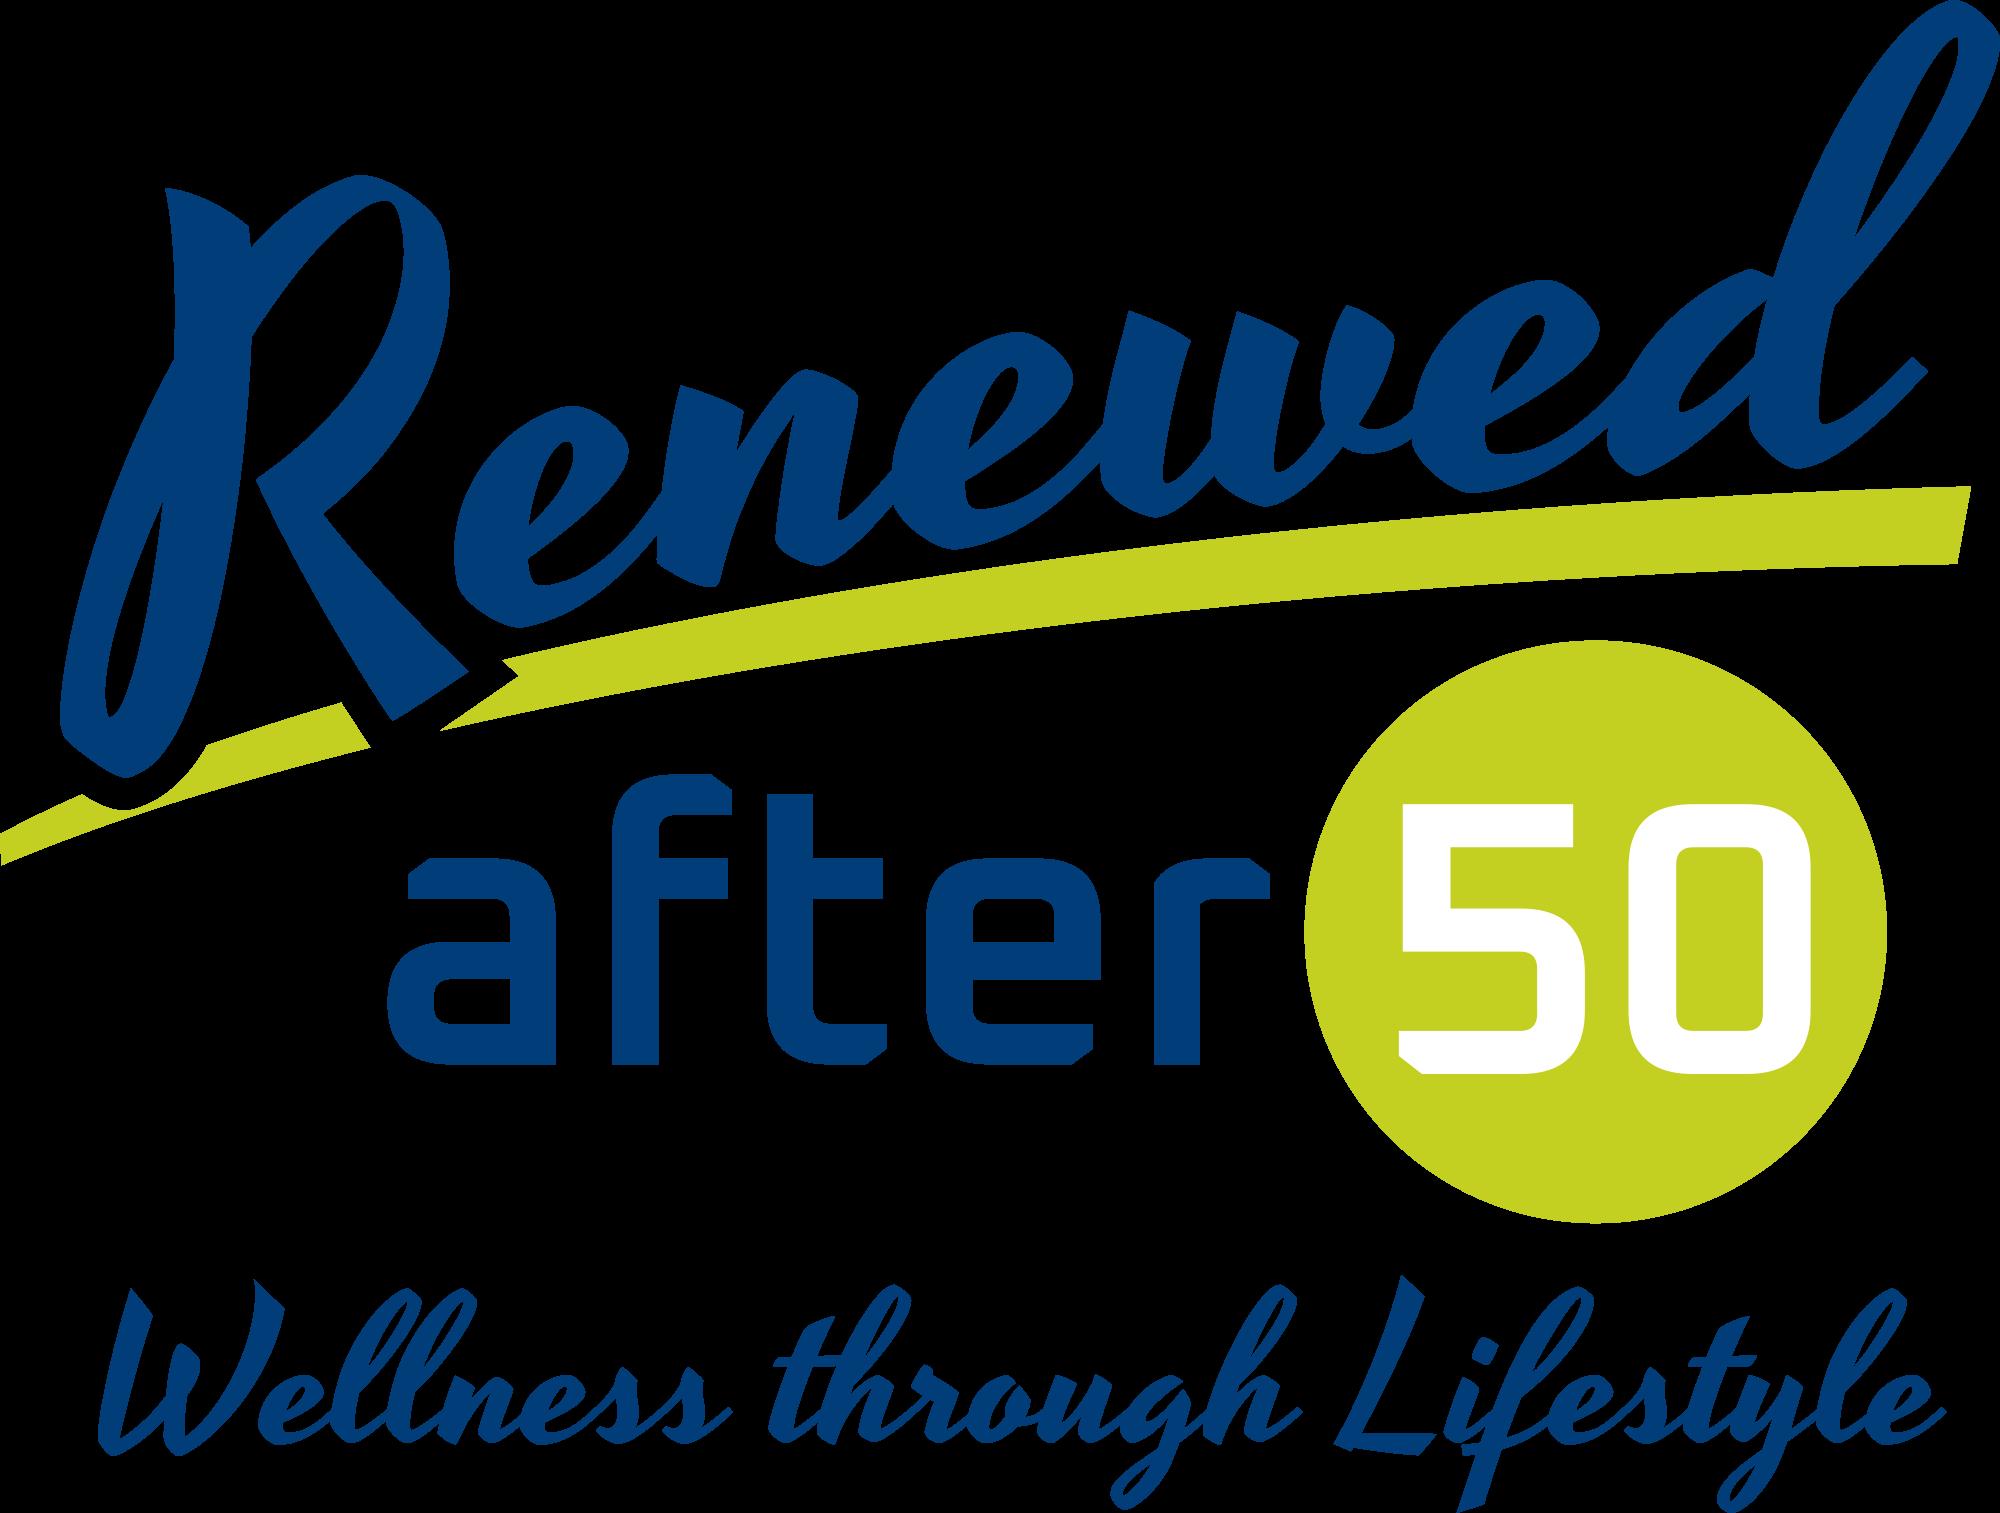 Renewed After 50